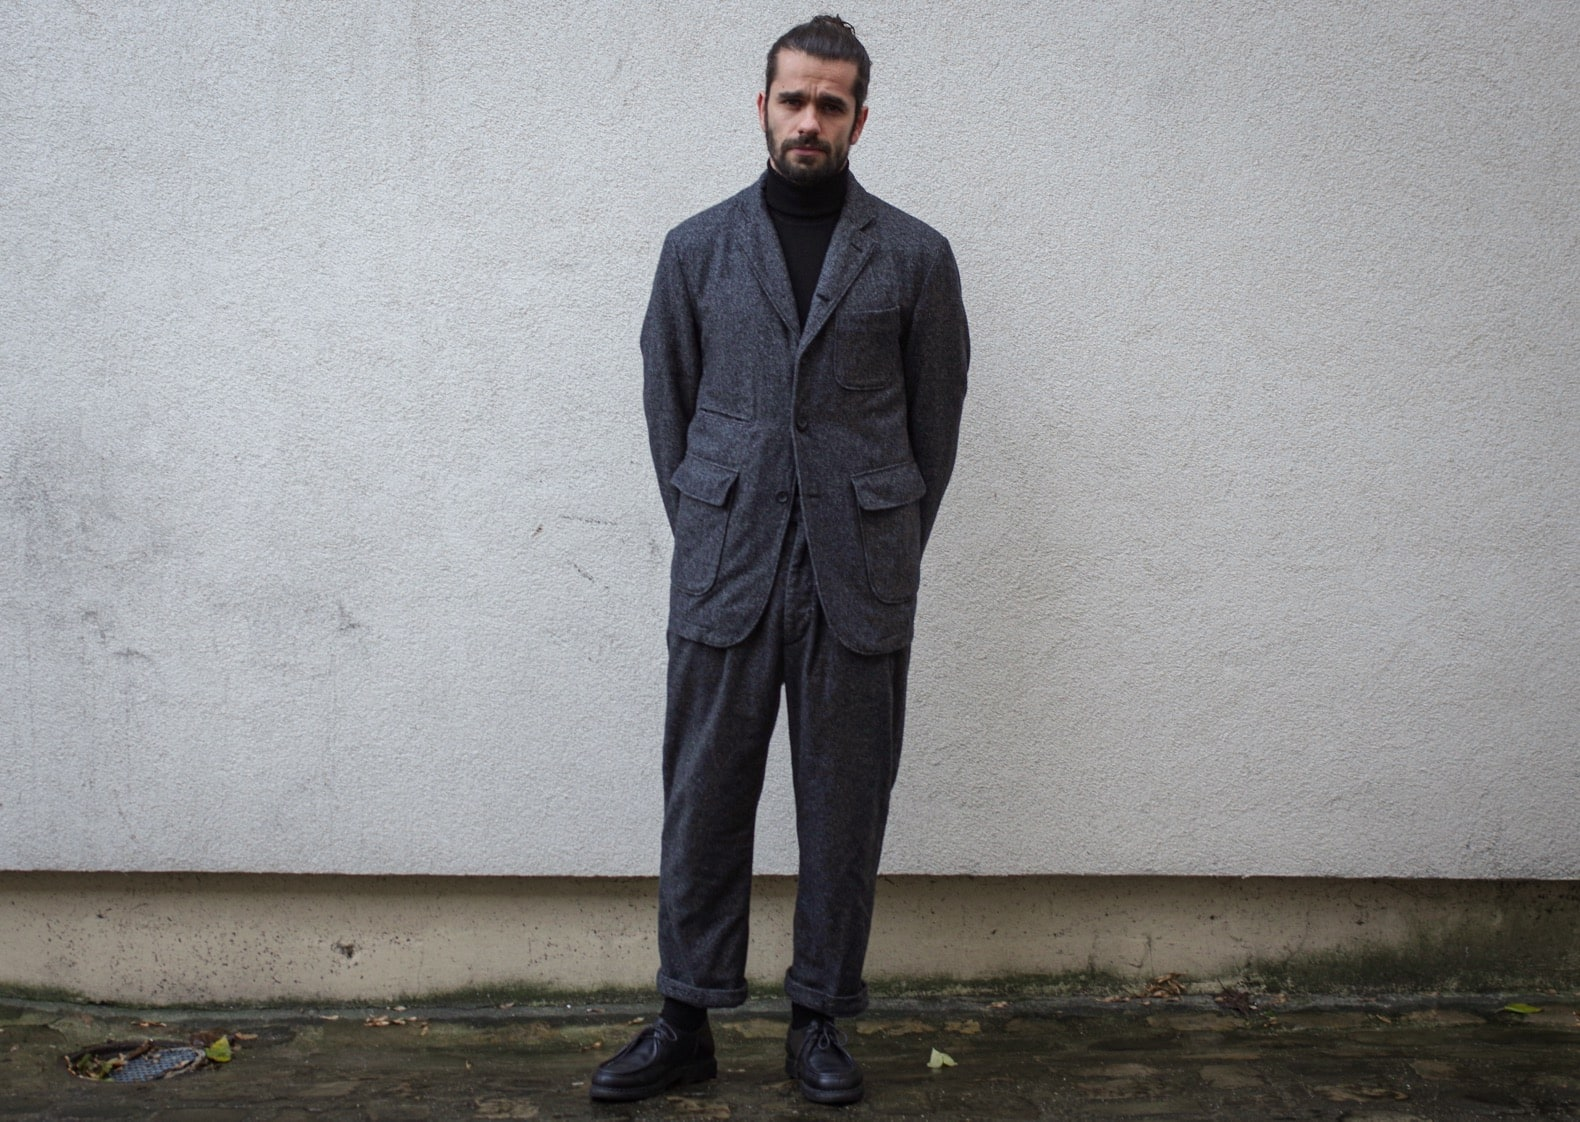 costume en laine épaisse hiver homme homespun engineered gamrents emerson pants baker jacket suite paraboot michale black